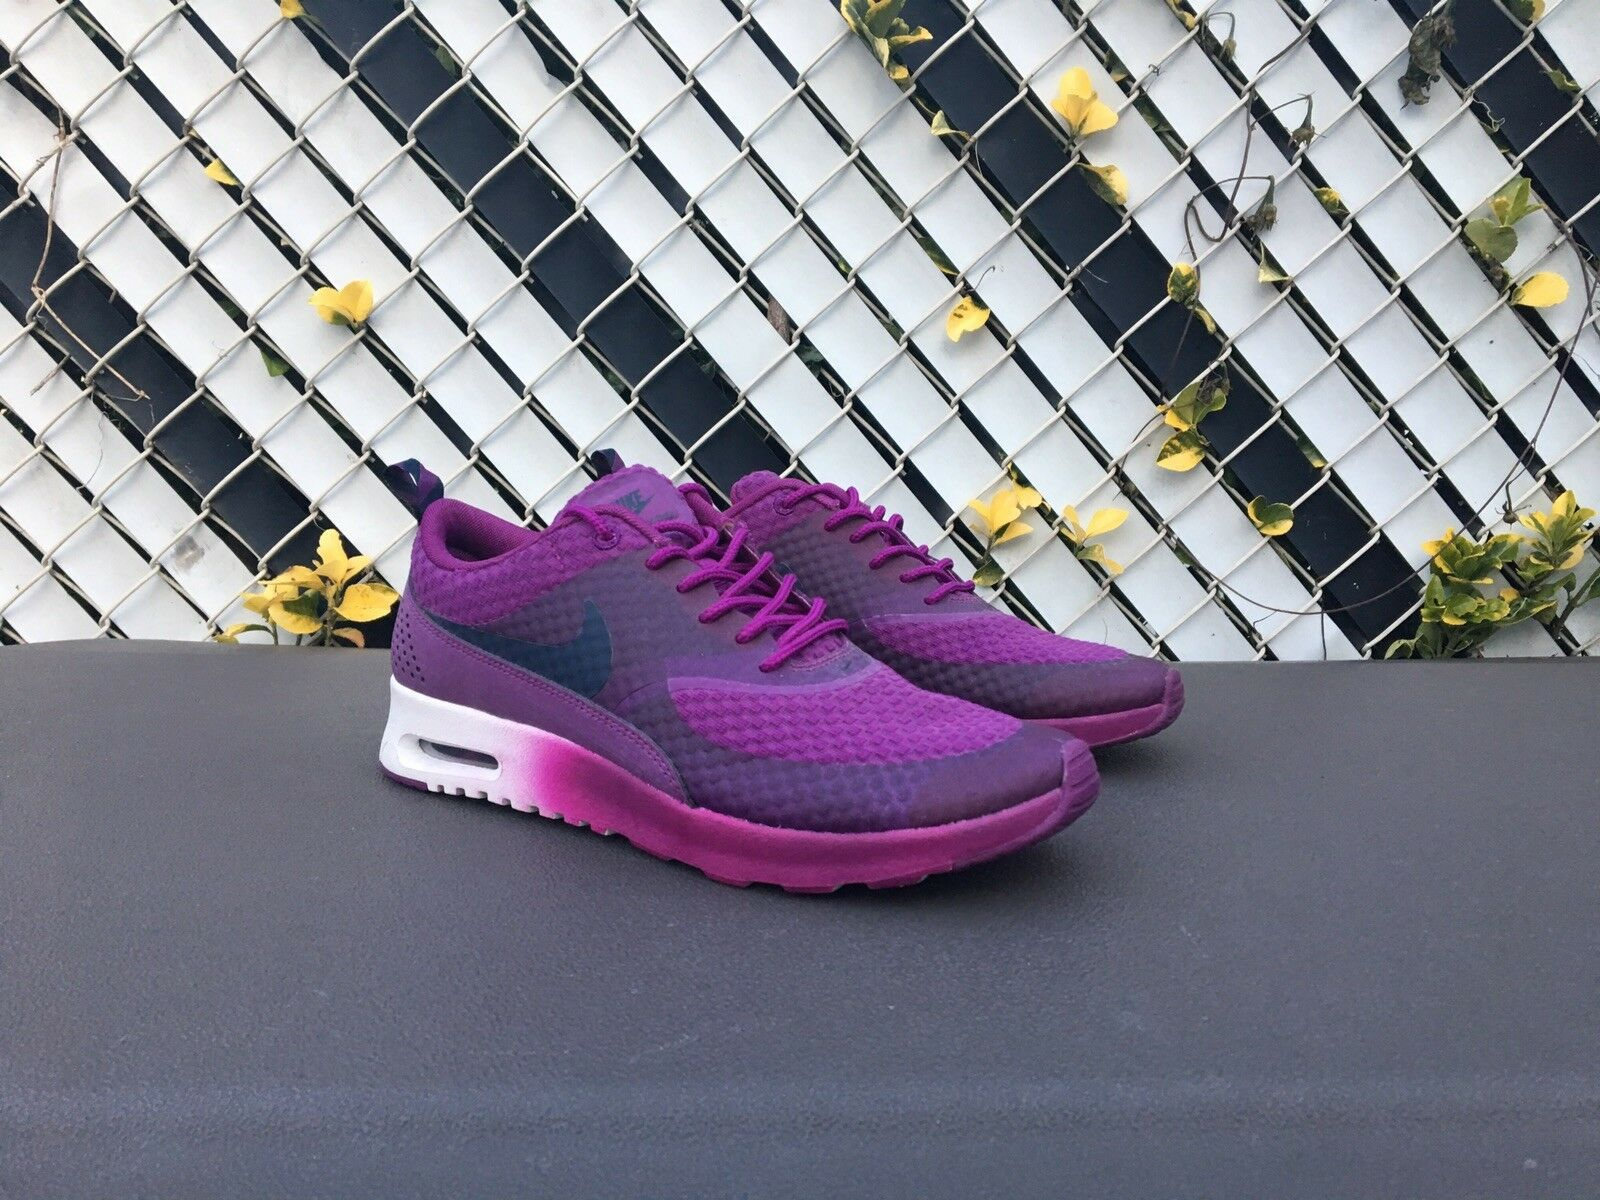 Nike Air Max Thea Premium Reflective Womens 8 Grape Purple PRM 616723 500 Zoom